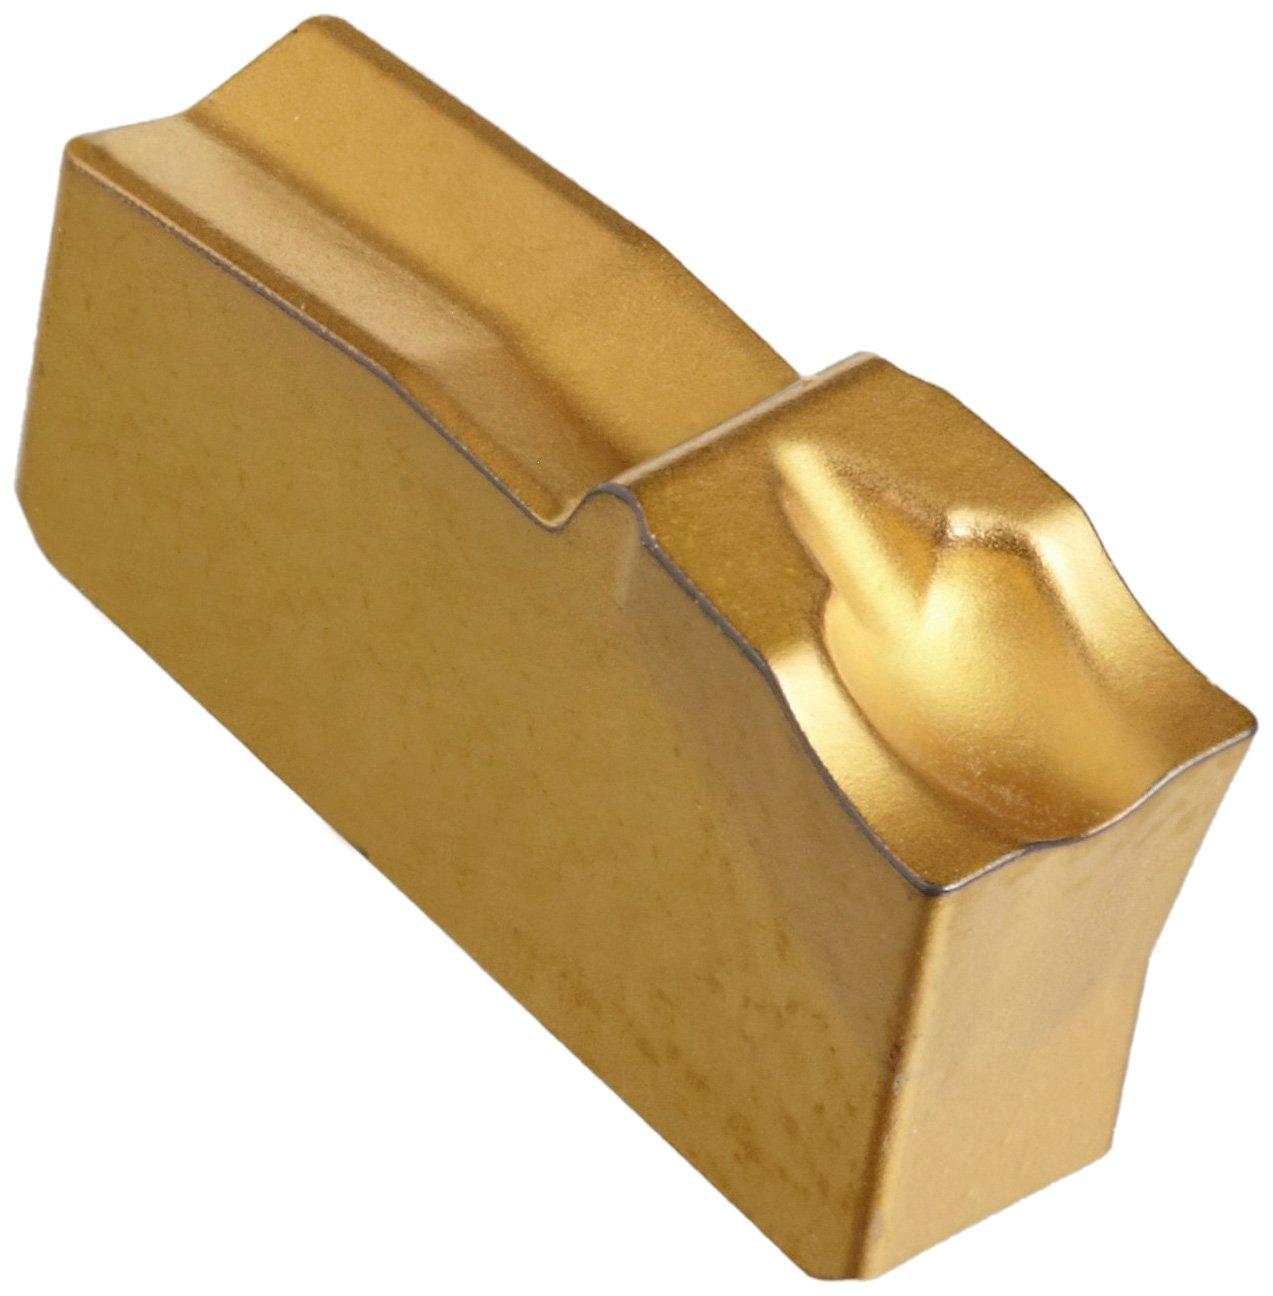 Sandvik Coromant Q-Cut 151.2 Carbide Parting Insert, GC2135 Grade, Multi-Layer Coating, 5E Chipbreaker, 1 Cutting Edge, N151.2-250-5E, 0.0079'' Corner Radius, 25 Insert Seat Size (Pack of 10)